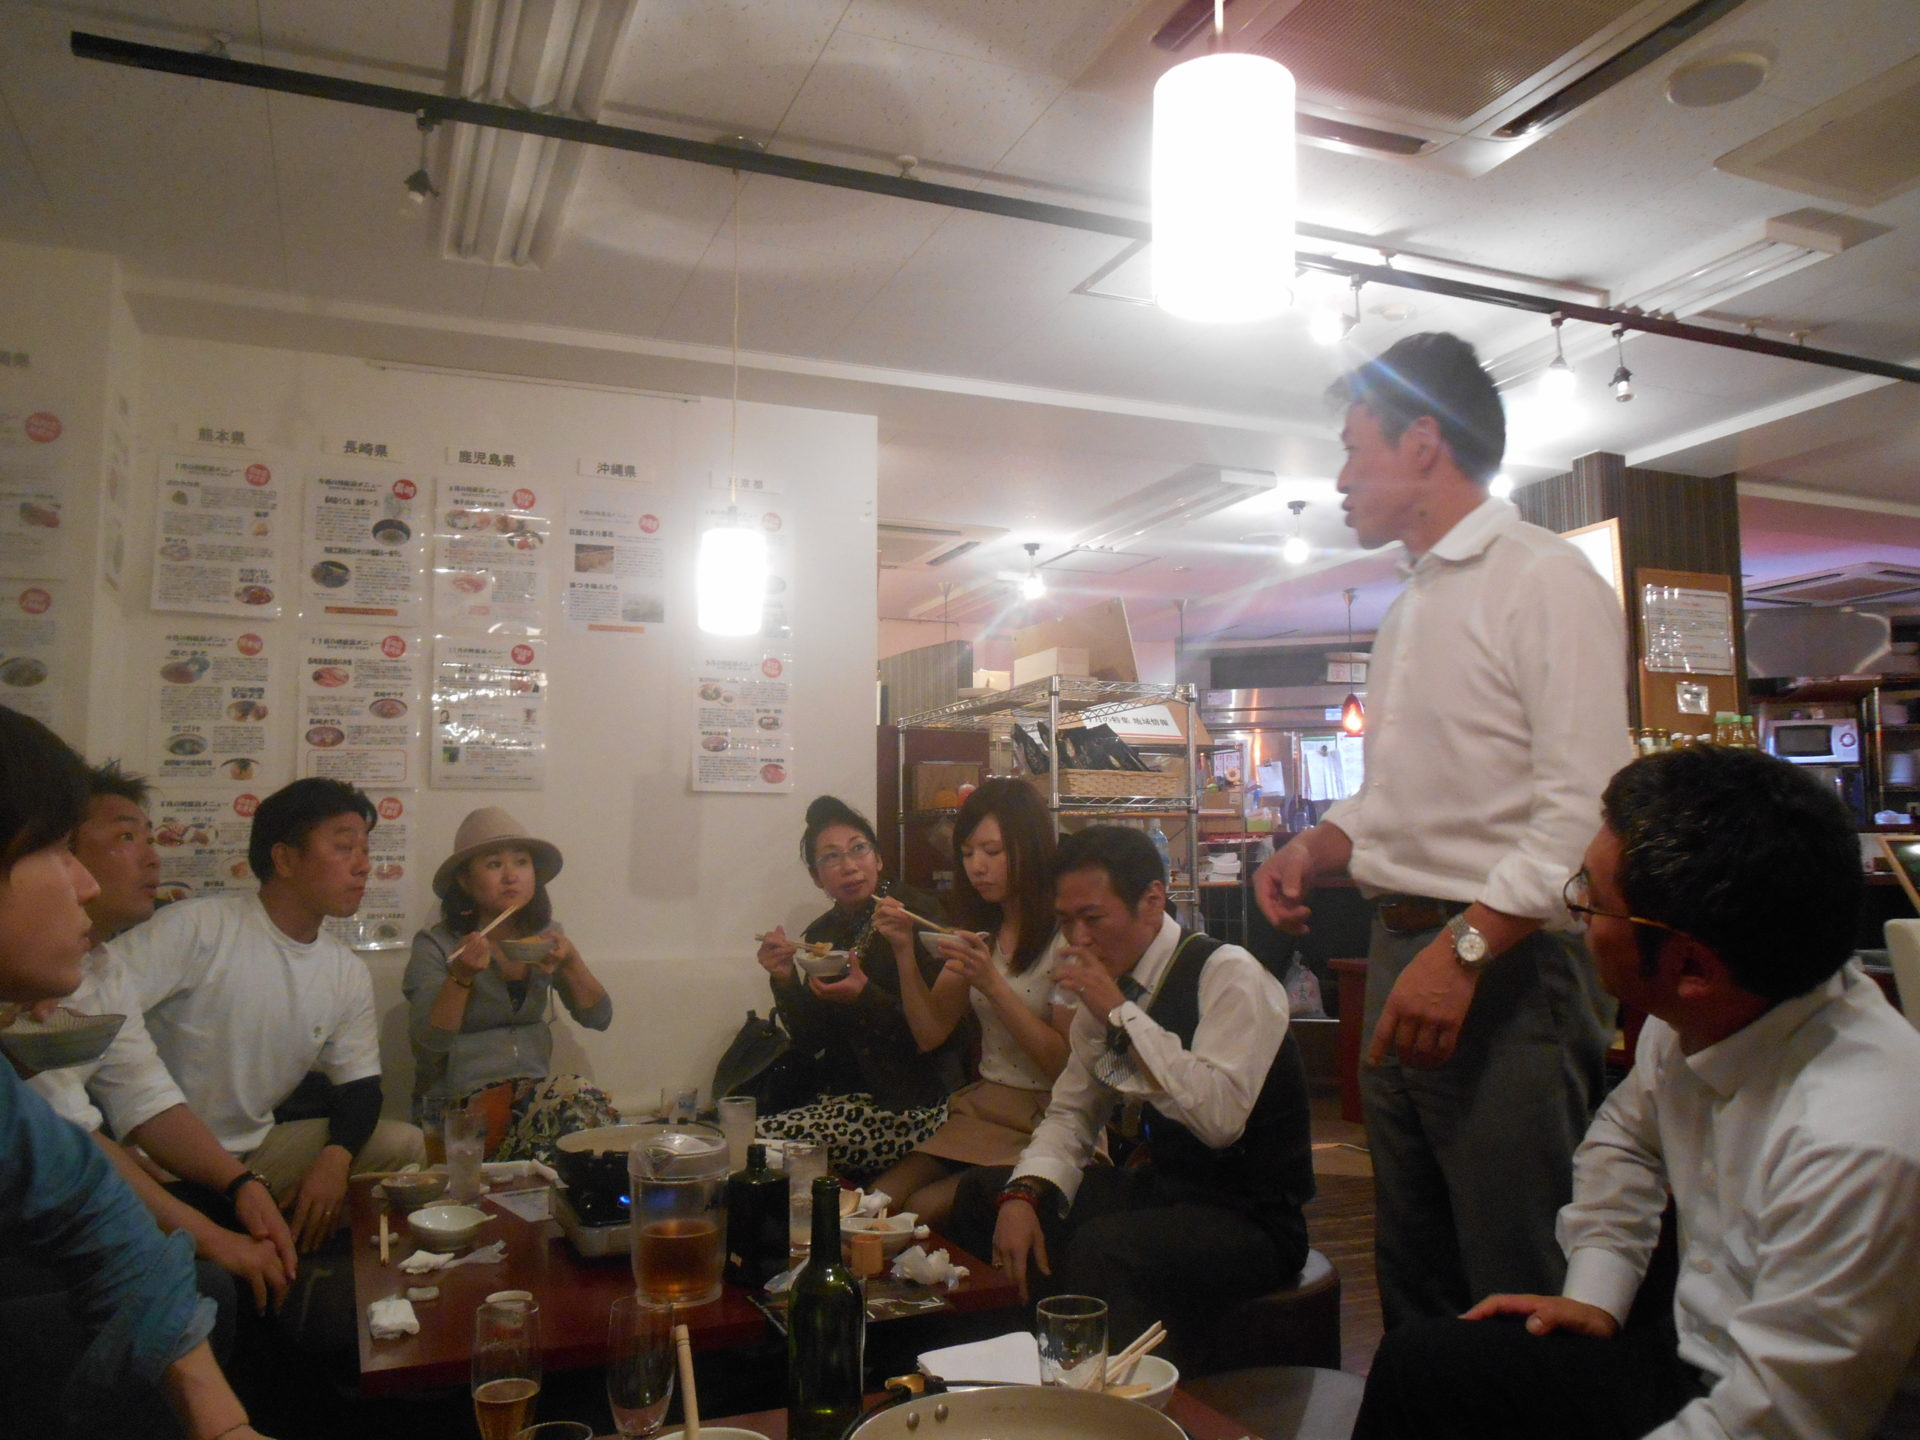 DSCN6038 1920x1440 - 2015年10月19日 AOsuki定例飲み会開催しました。